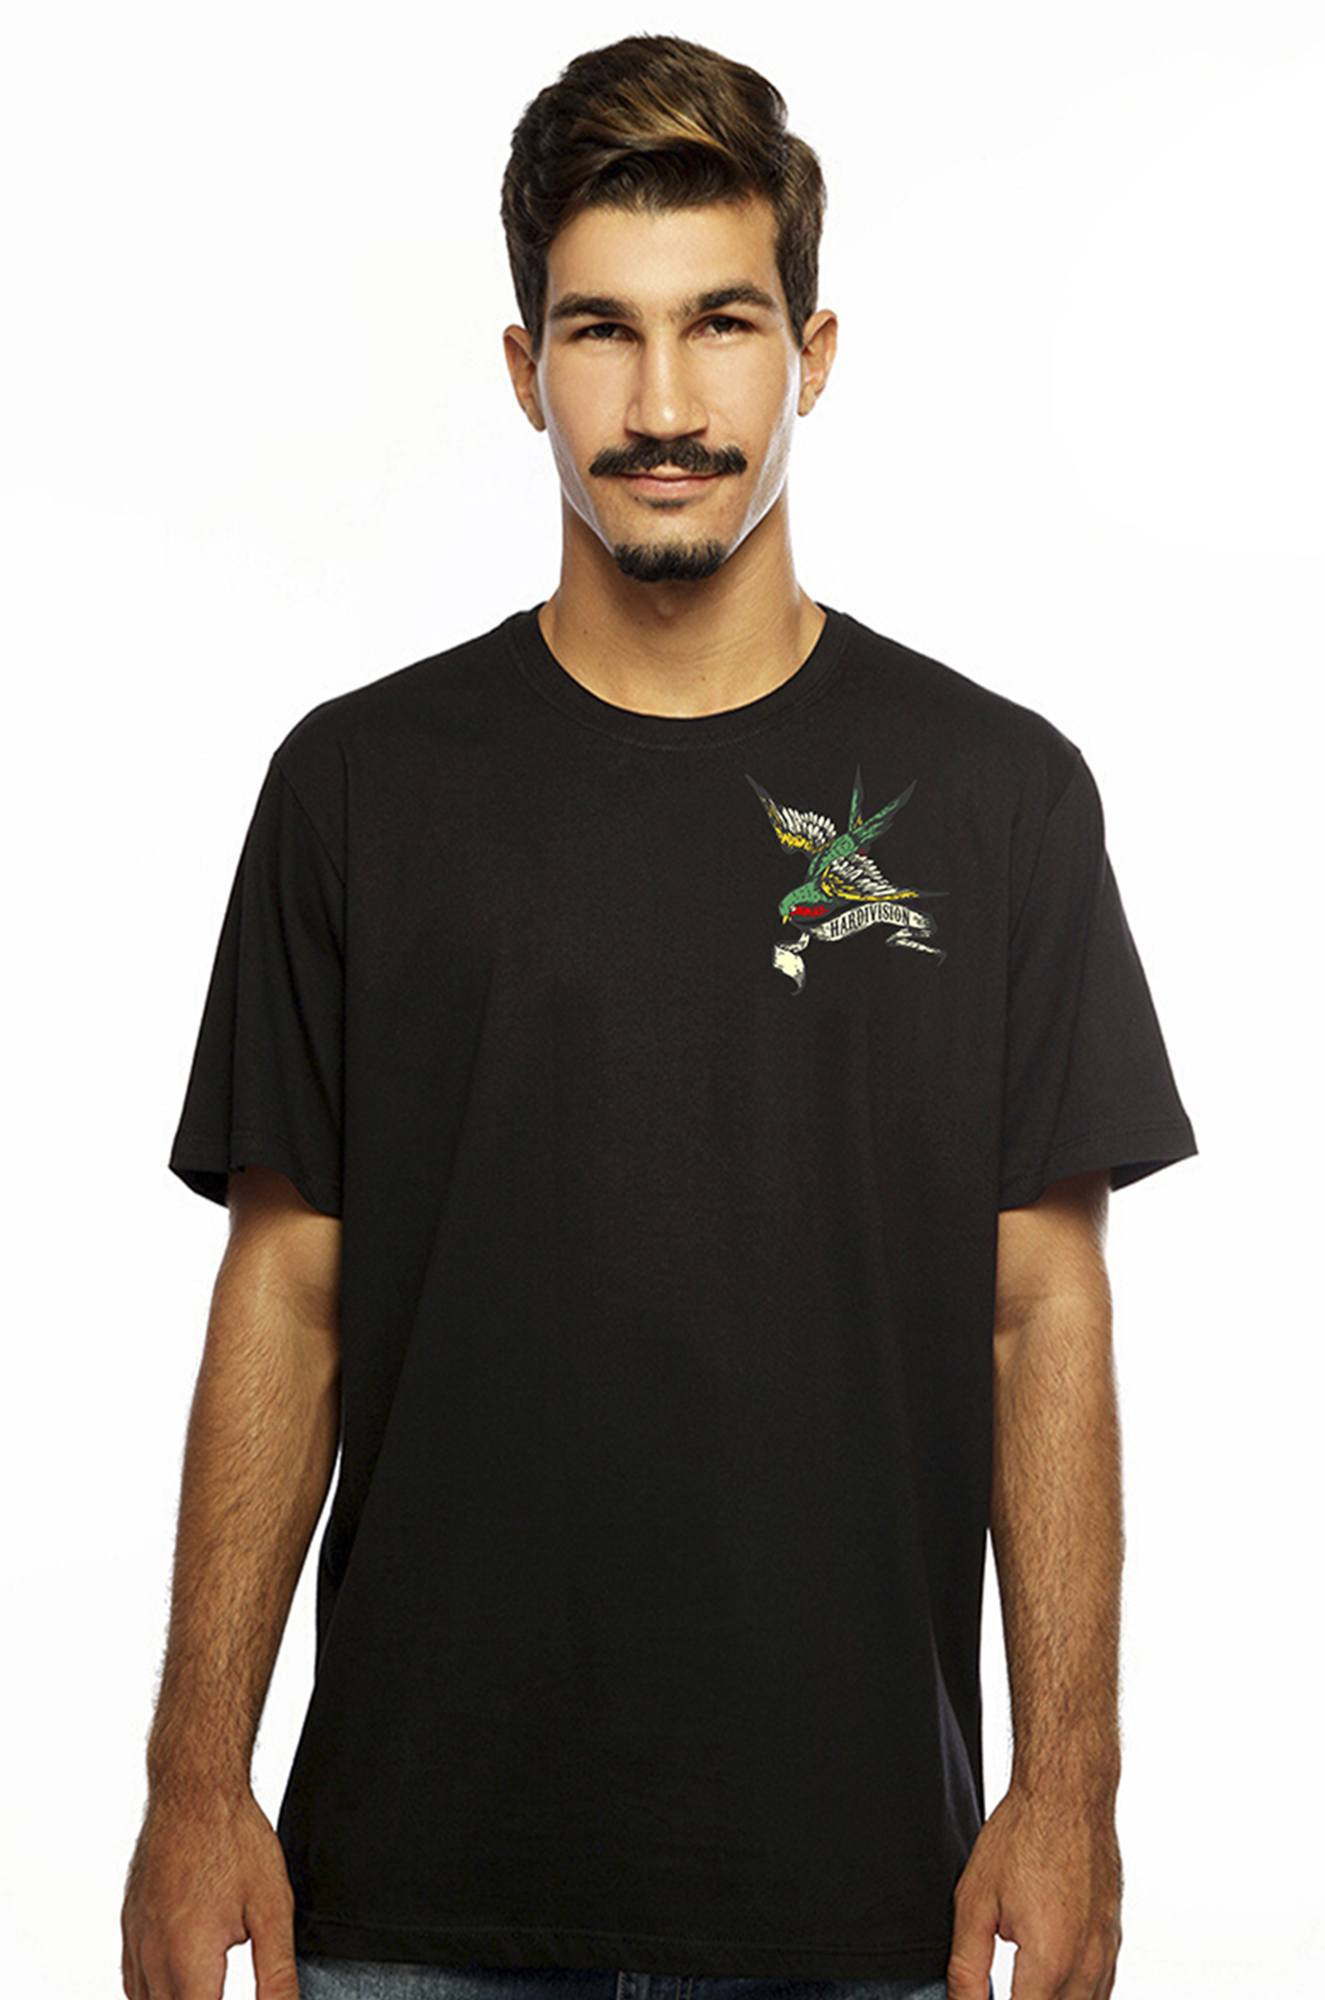 Camiseta masculina preta Hope 100% algodão - Hardivision